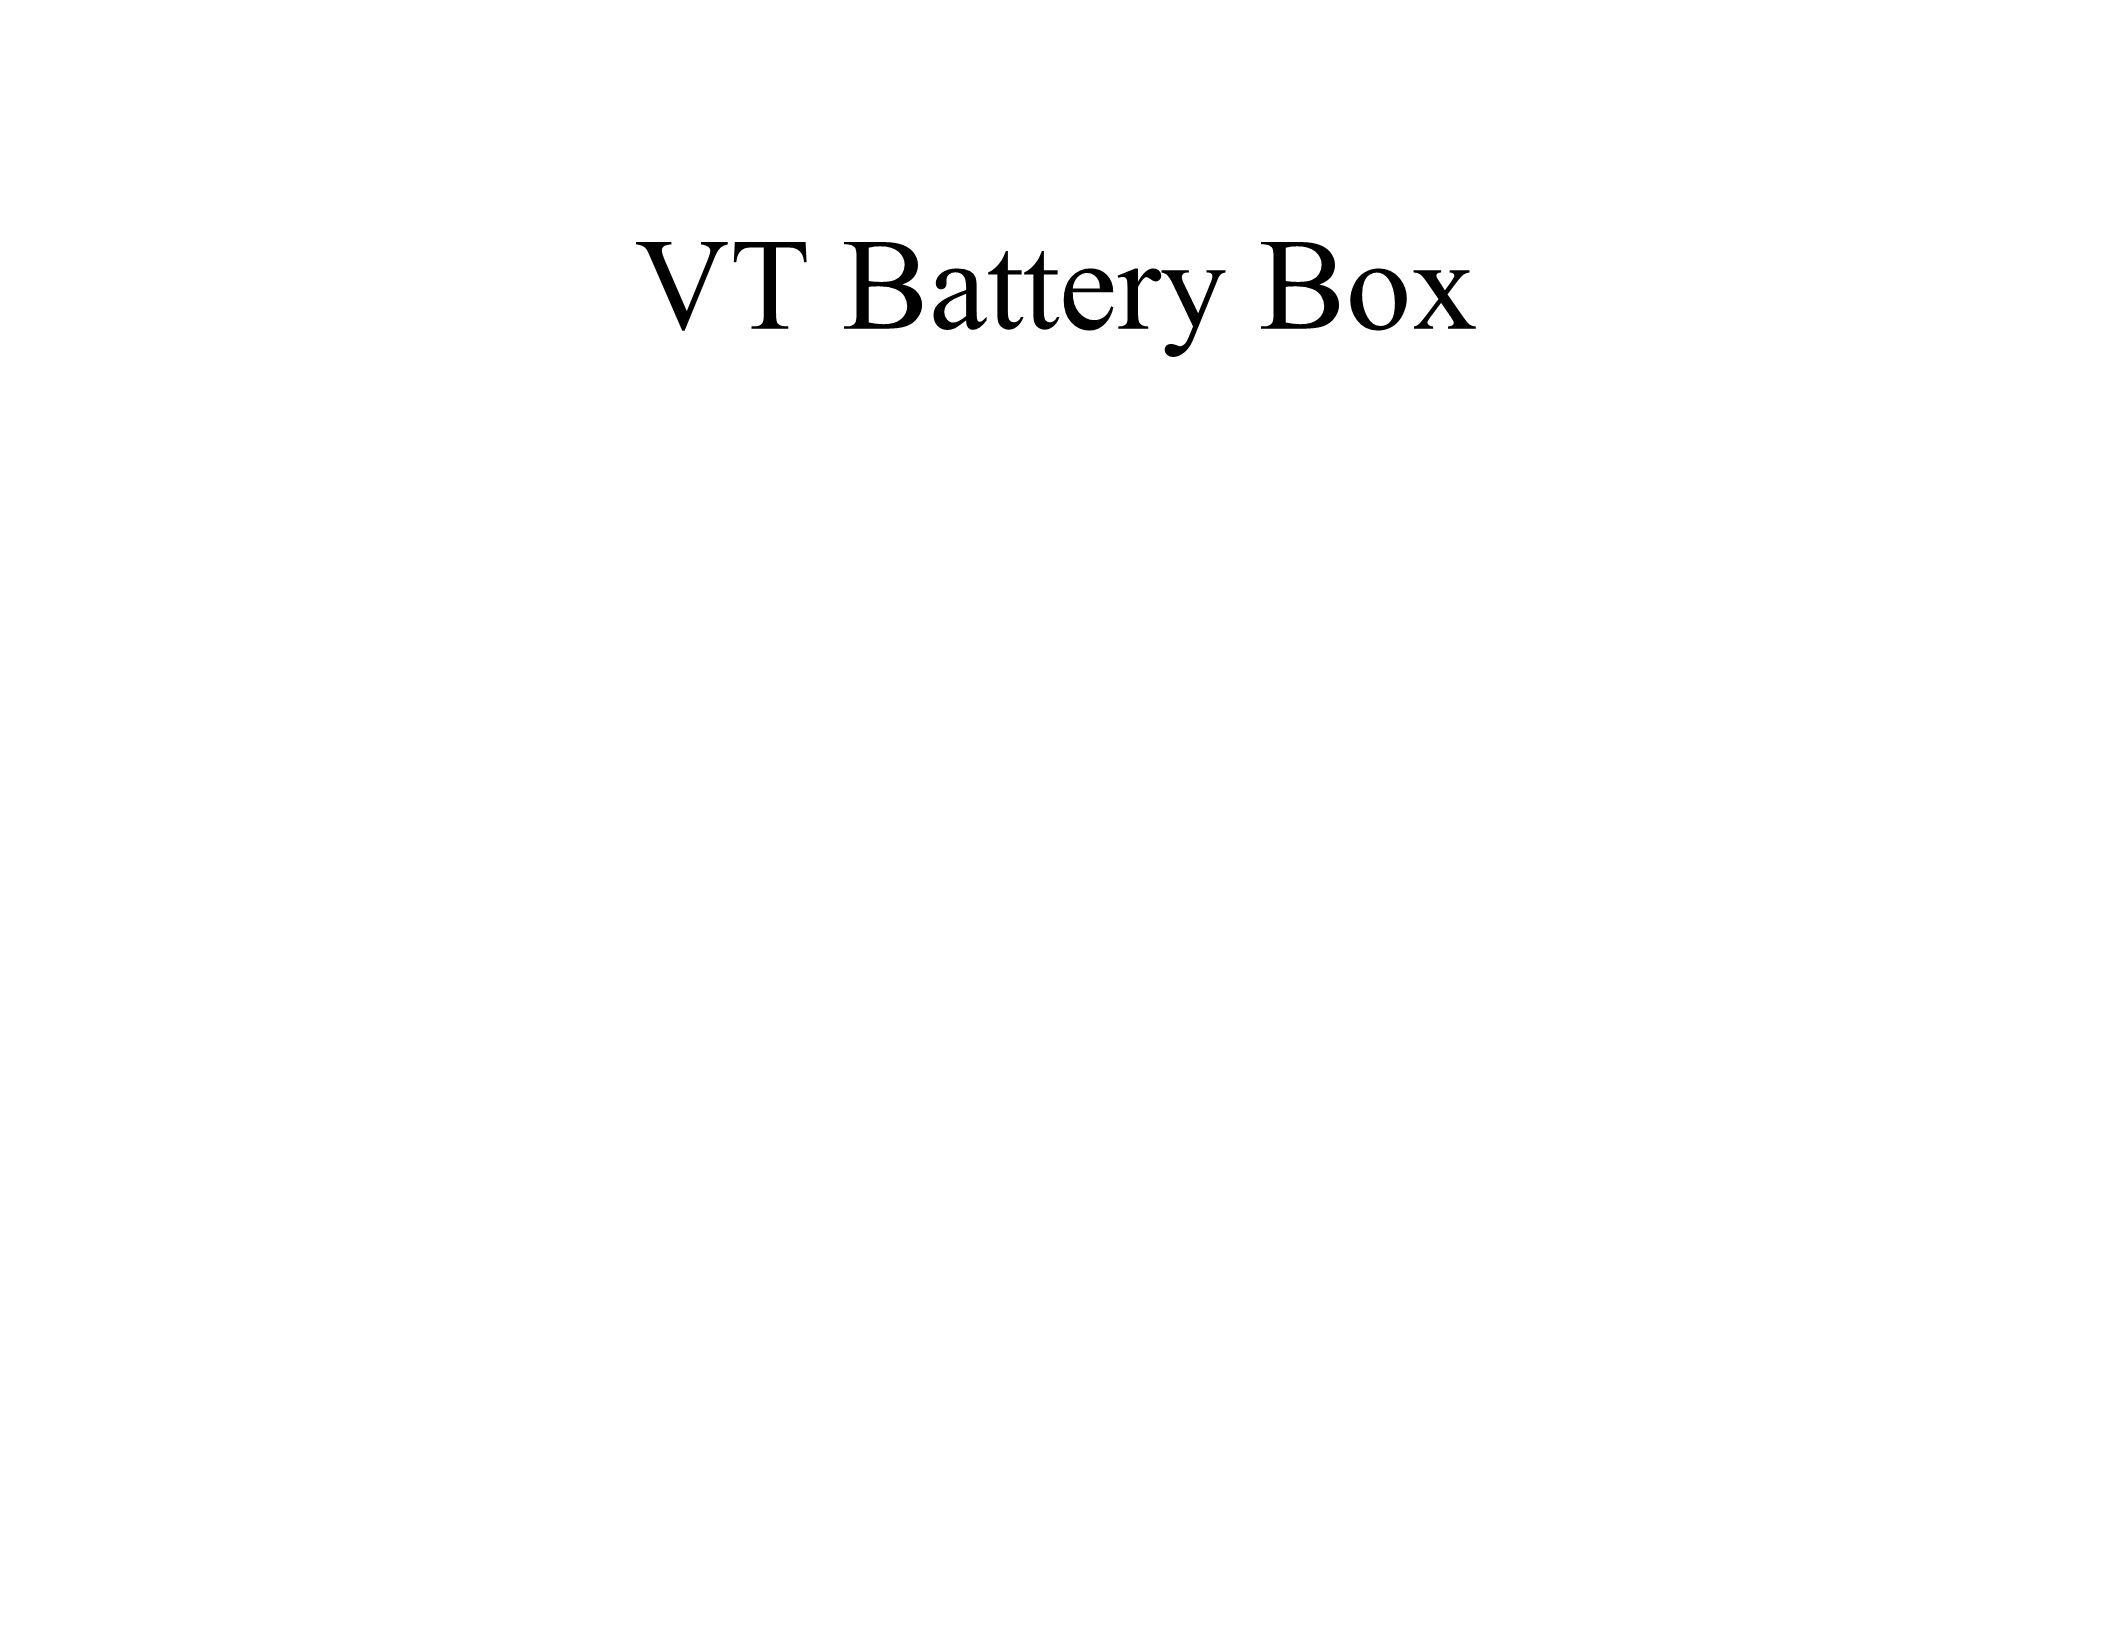 VT Battery Box